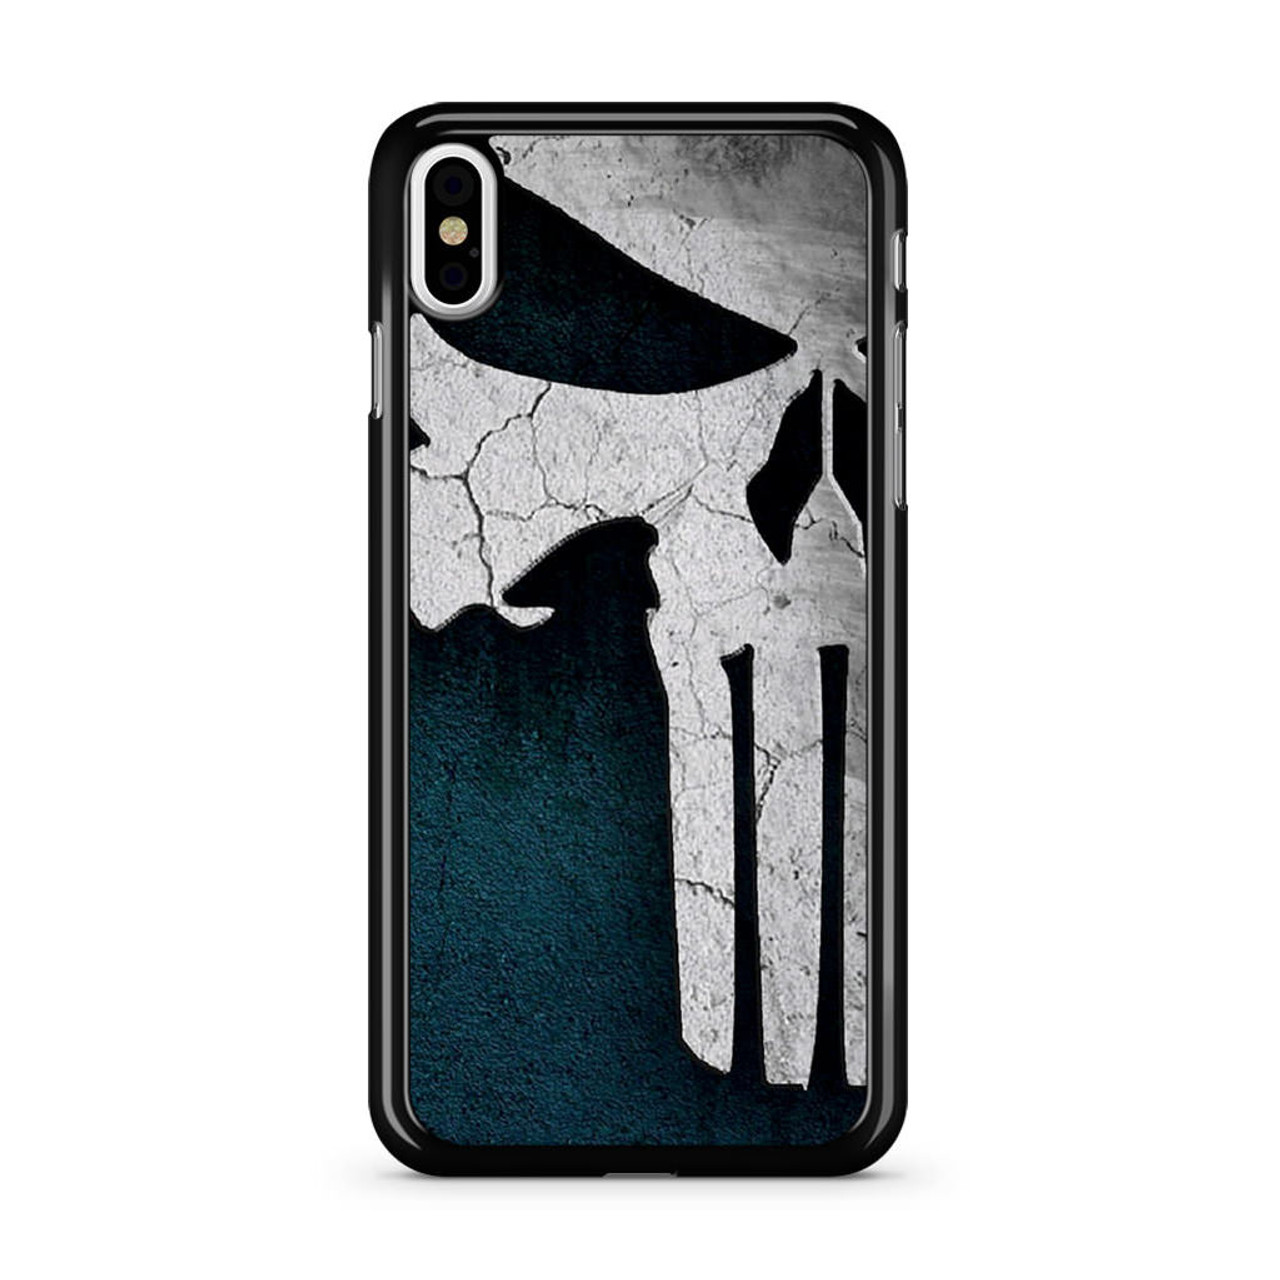 Punisher Iphone S Case